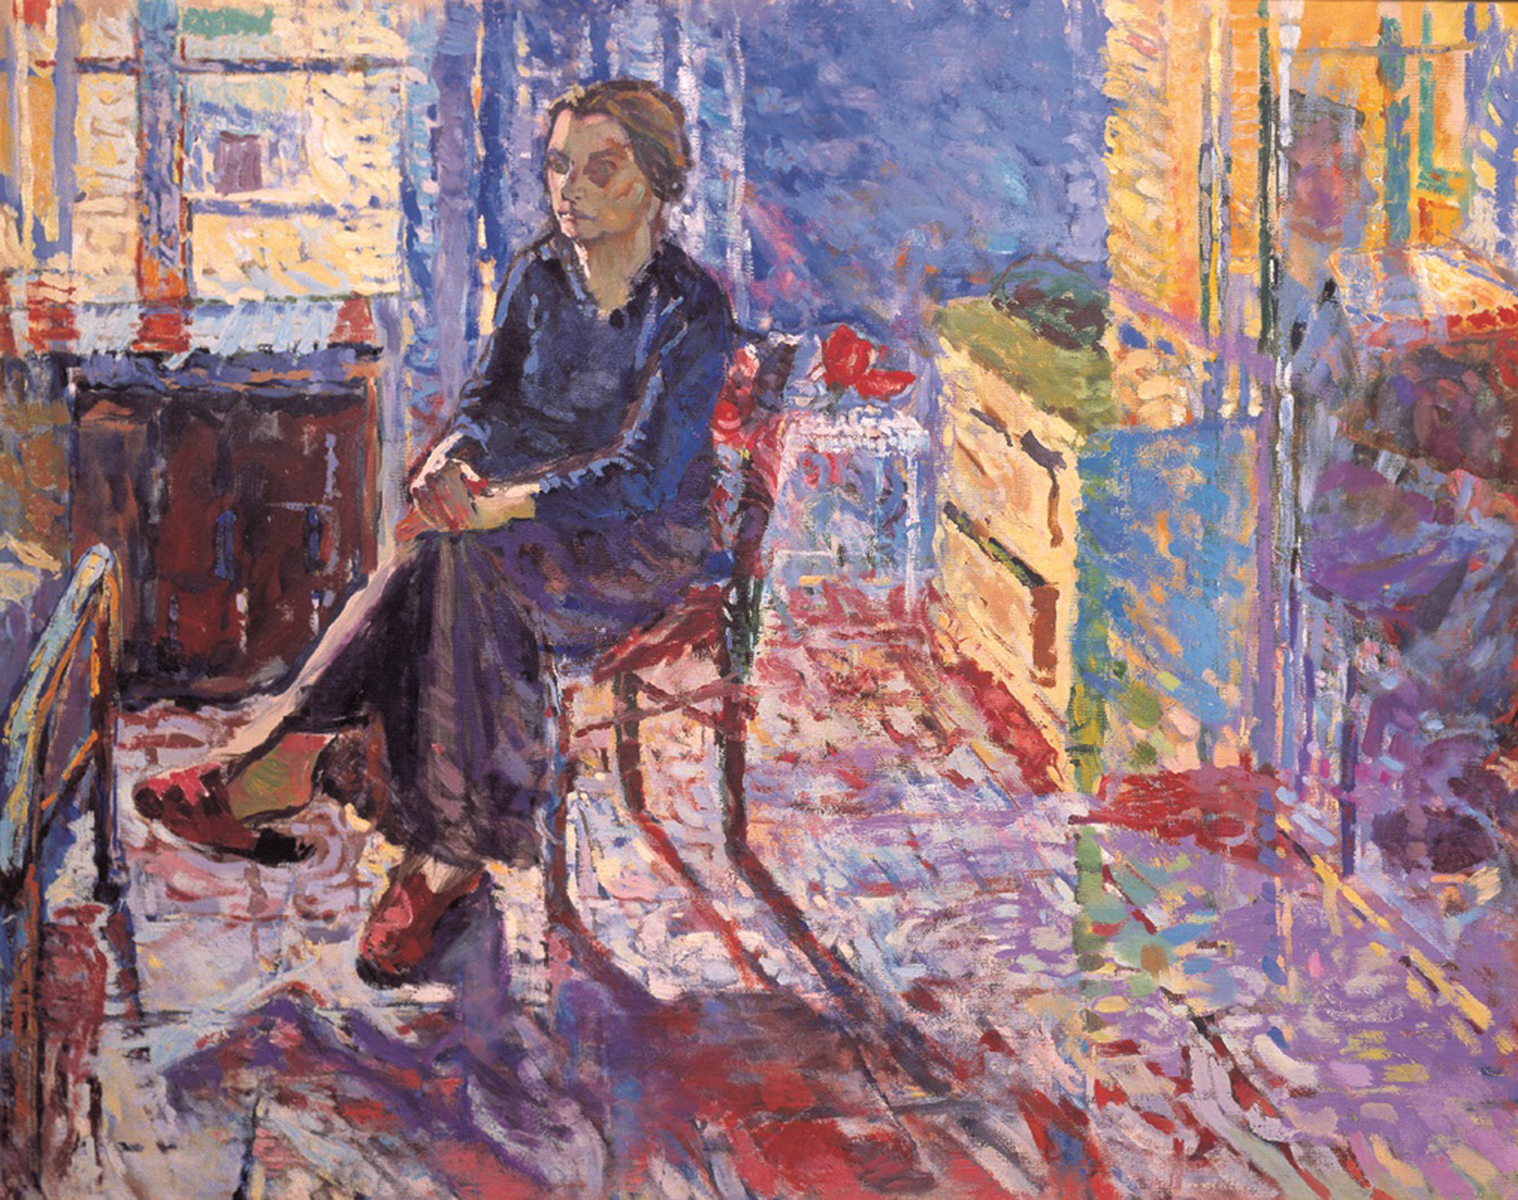 Madre del pintor, oleo sobre lienzo 60x73cm. Decada 70